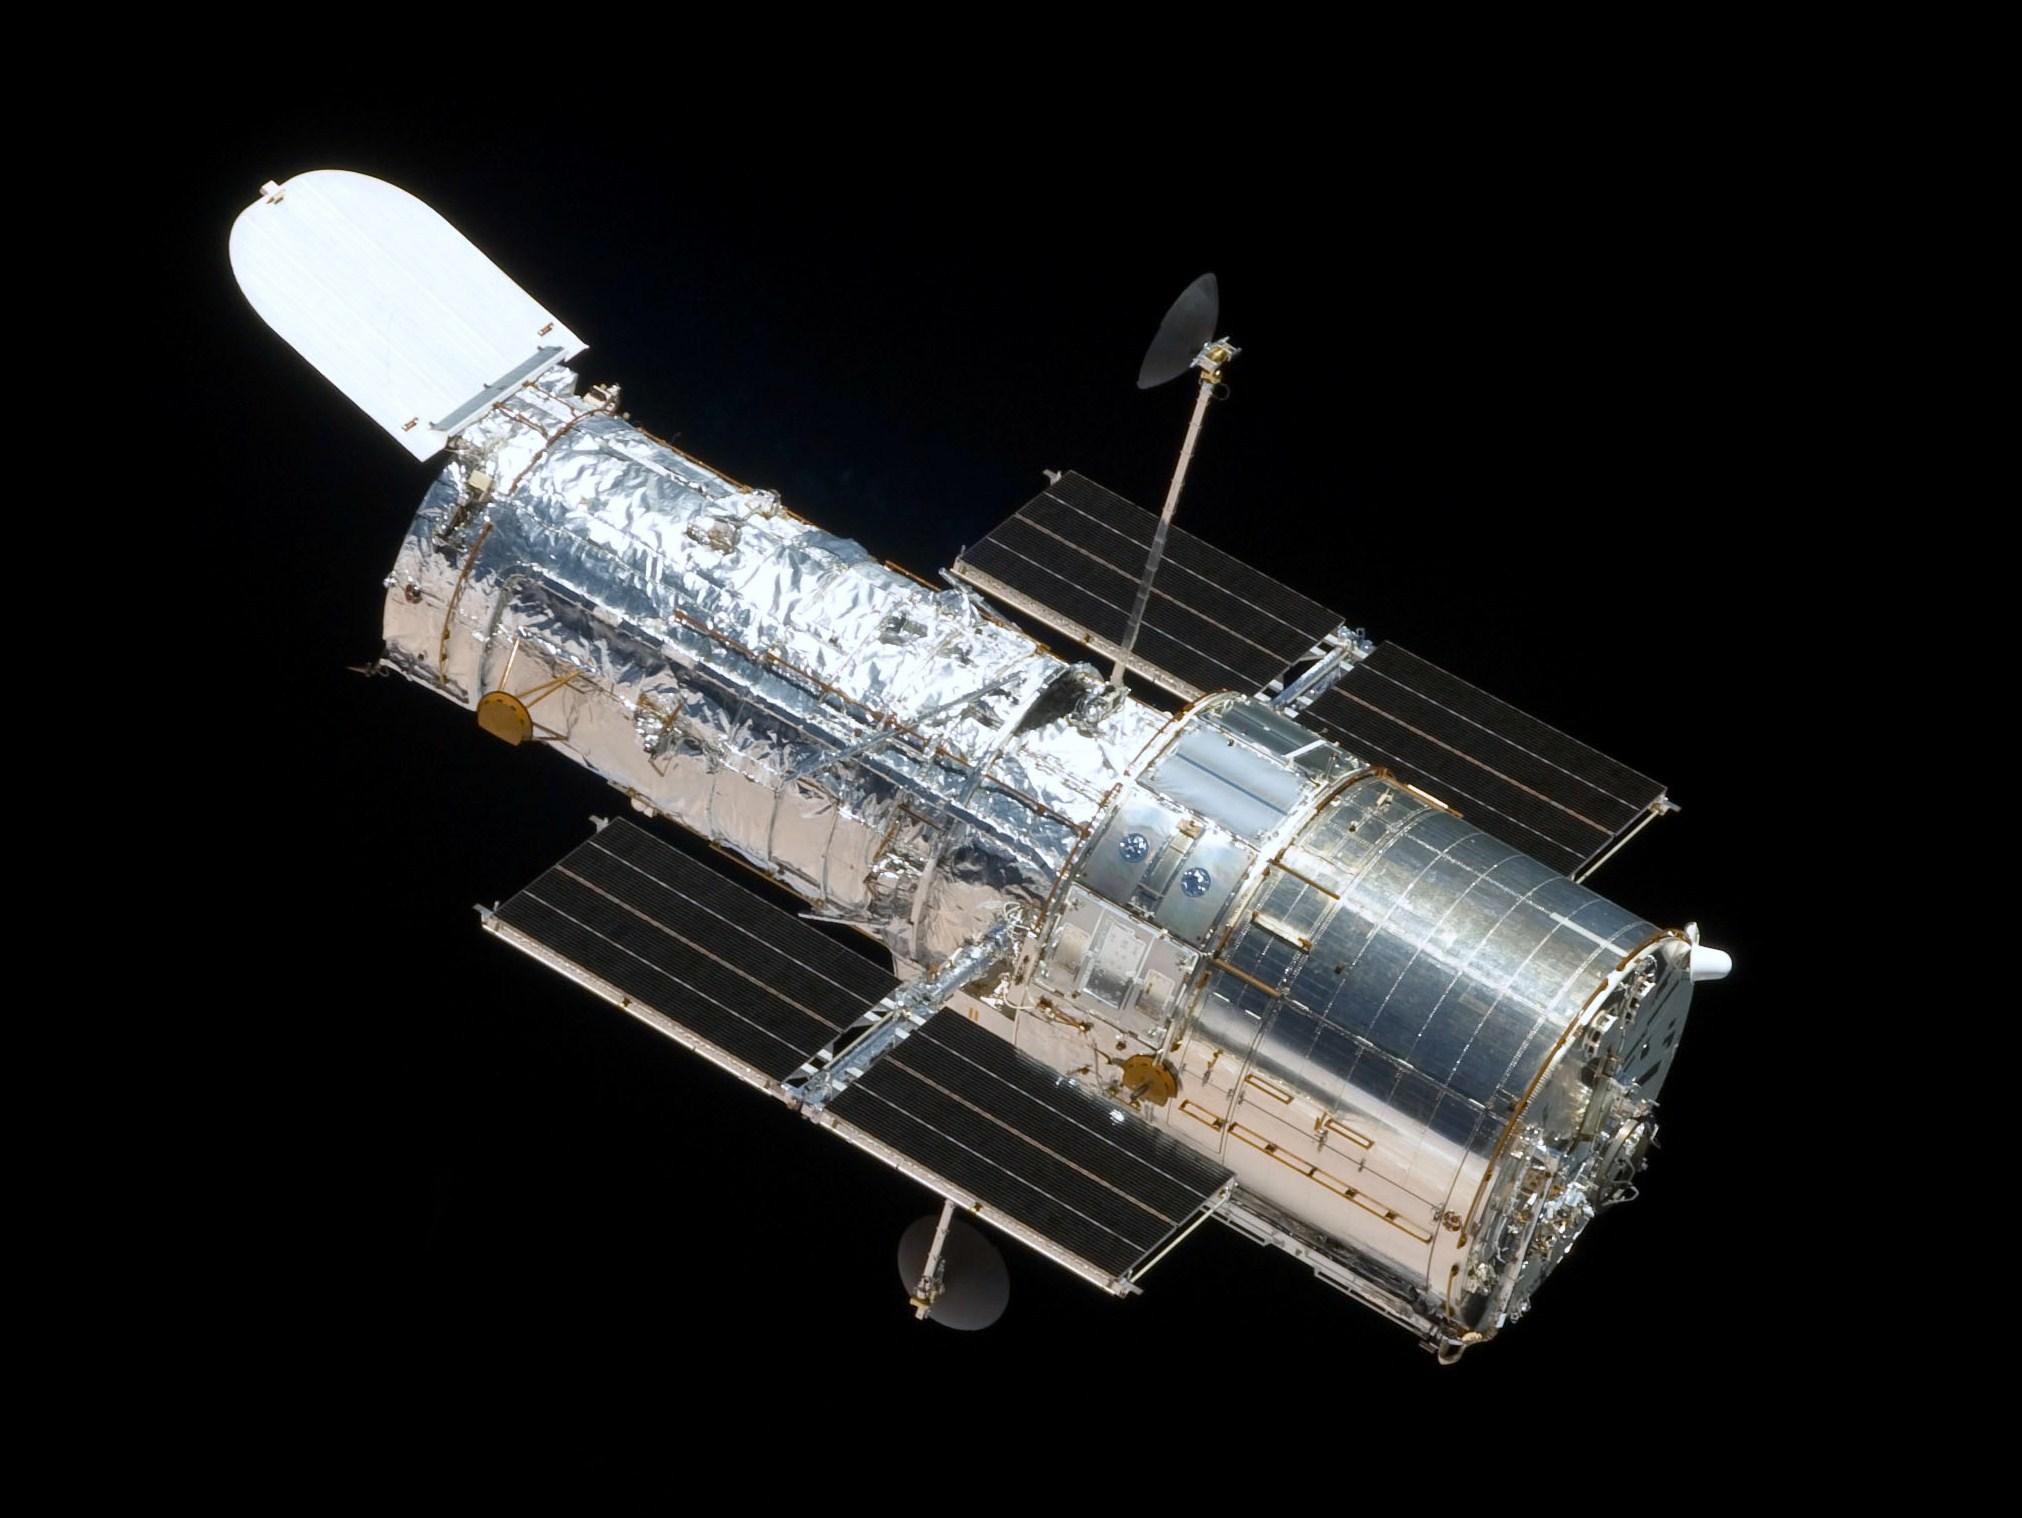 NASA'S Hubblespace Telescope failure